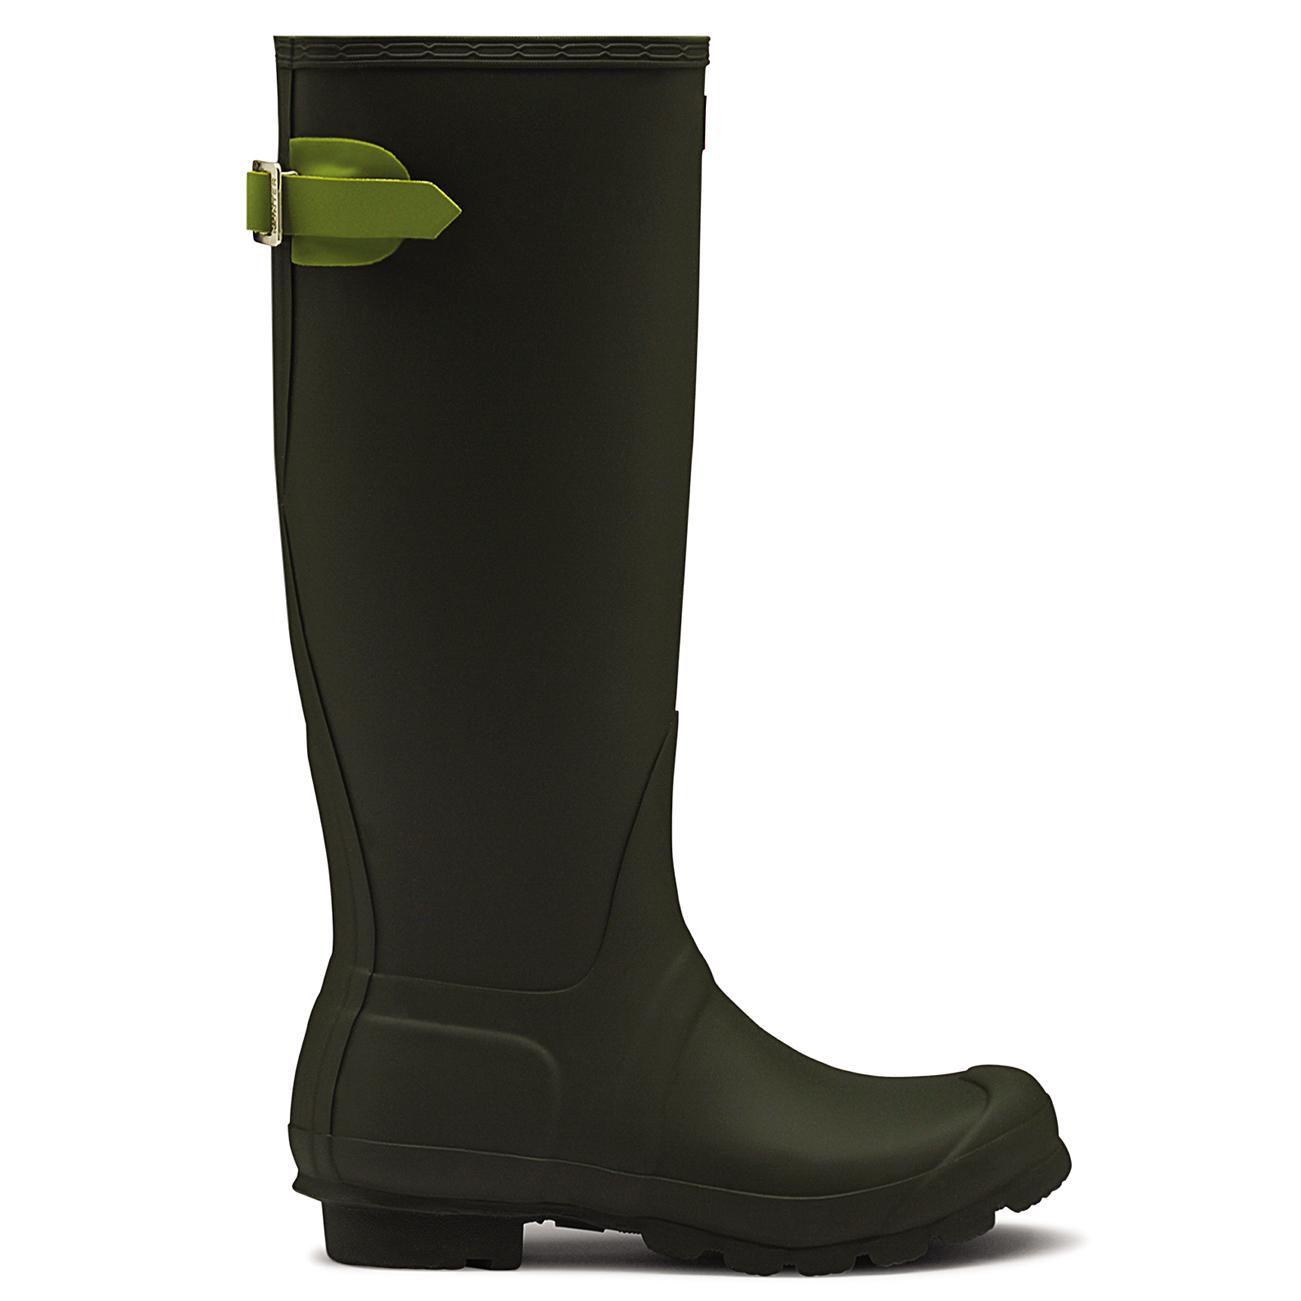 Womens Hunter Adjustable Back Wellingtons Waterproof Rubber Rain Boots US 5-11 | eBay